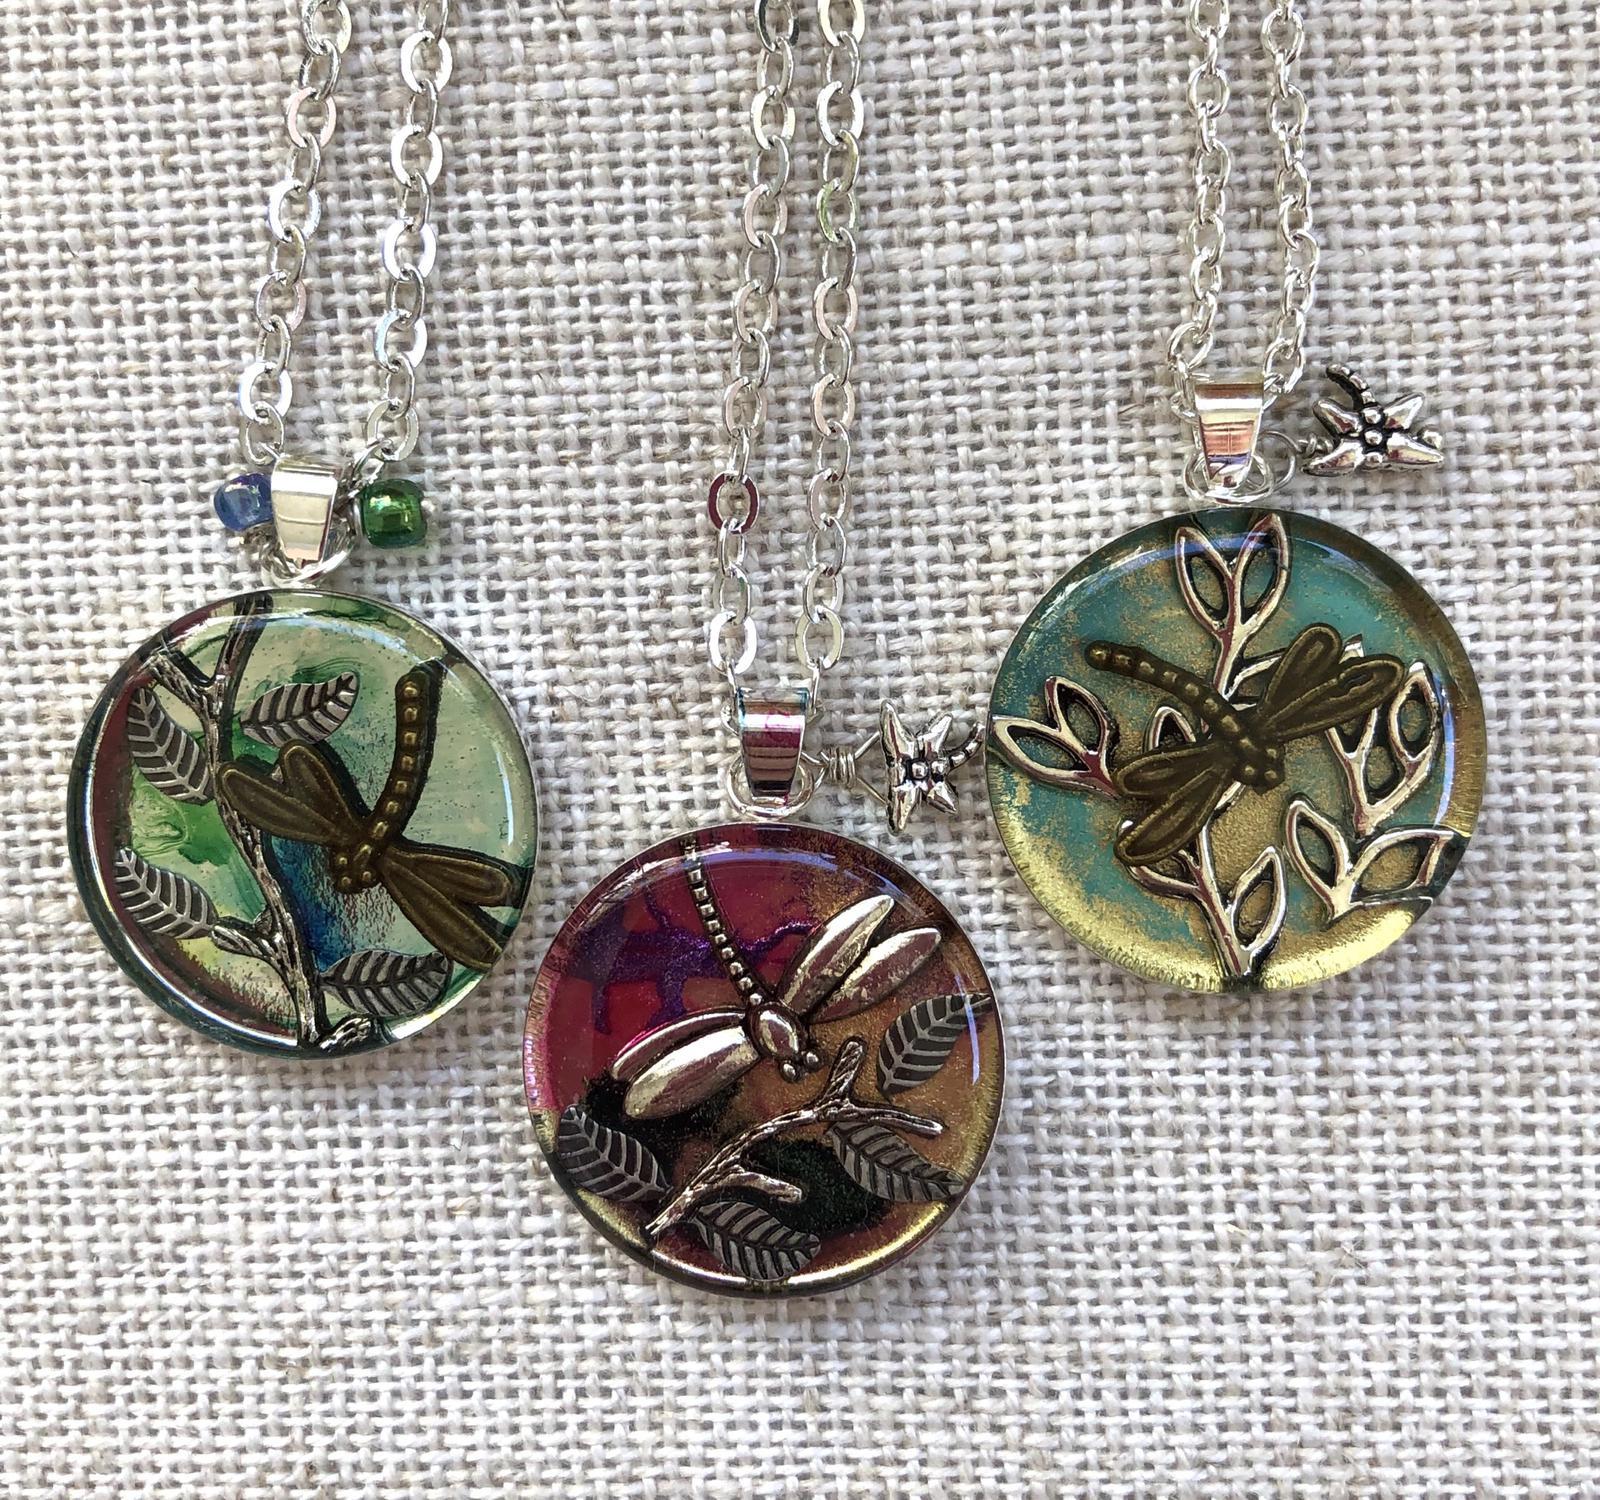 Tiny Dragonflies resin pendants 25mm